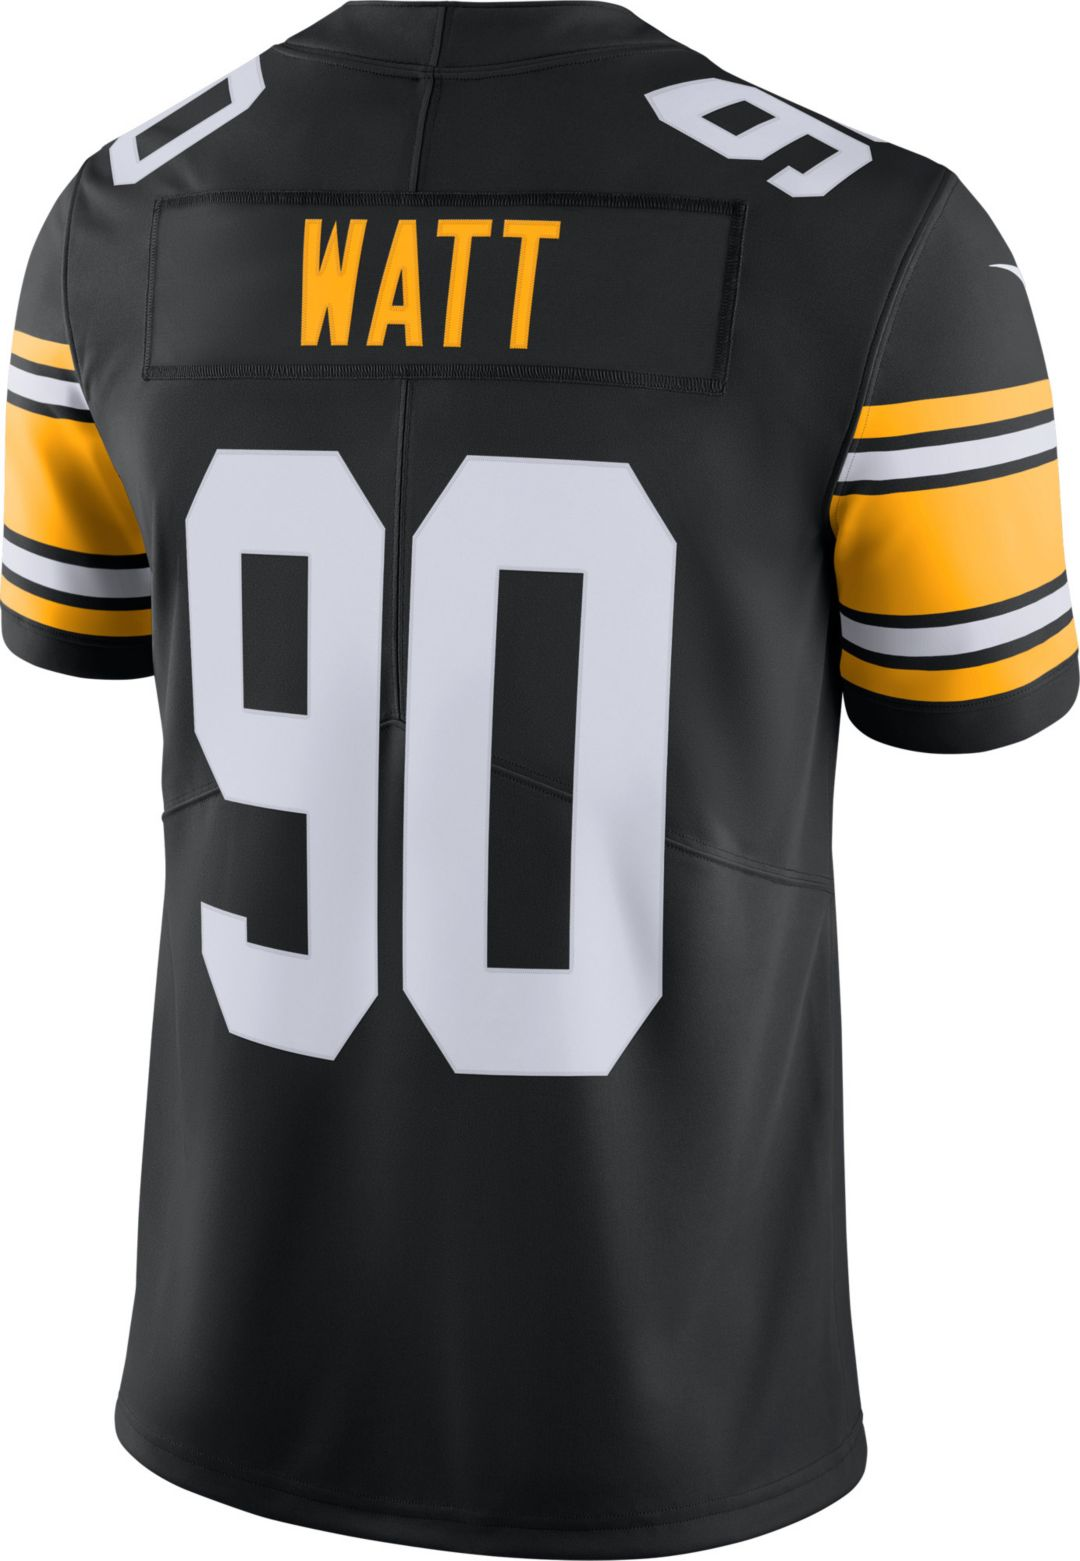 best loved 4525c c3eec Nike Men's Alternate Limited Jersey Pittsburgh Steelers T.J. Watt #90